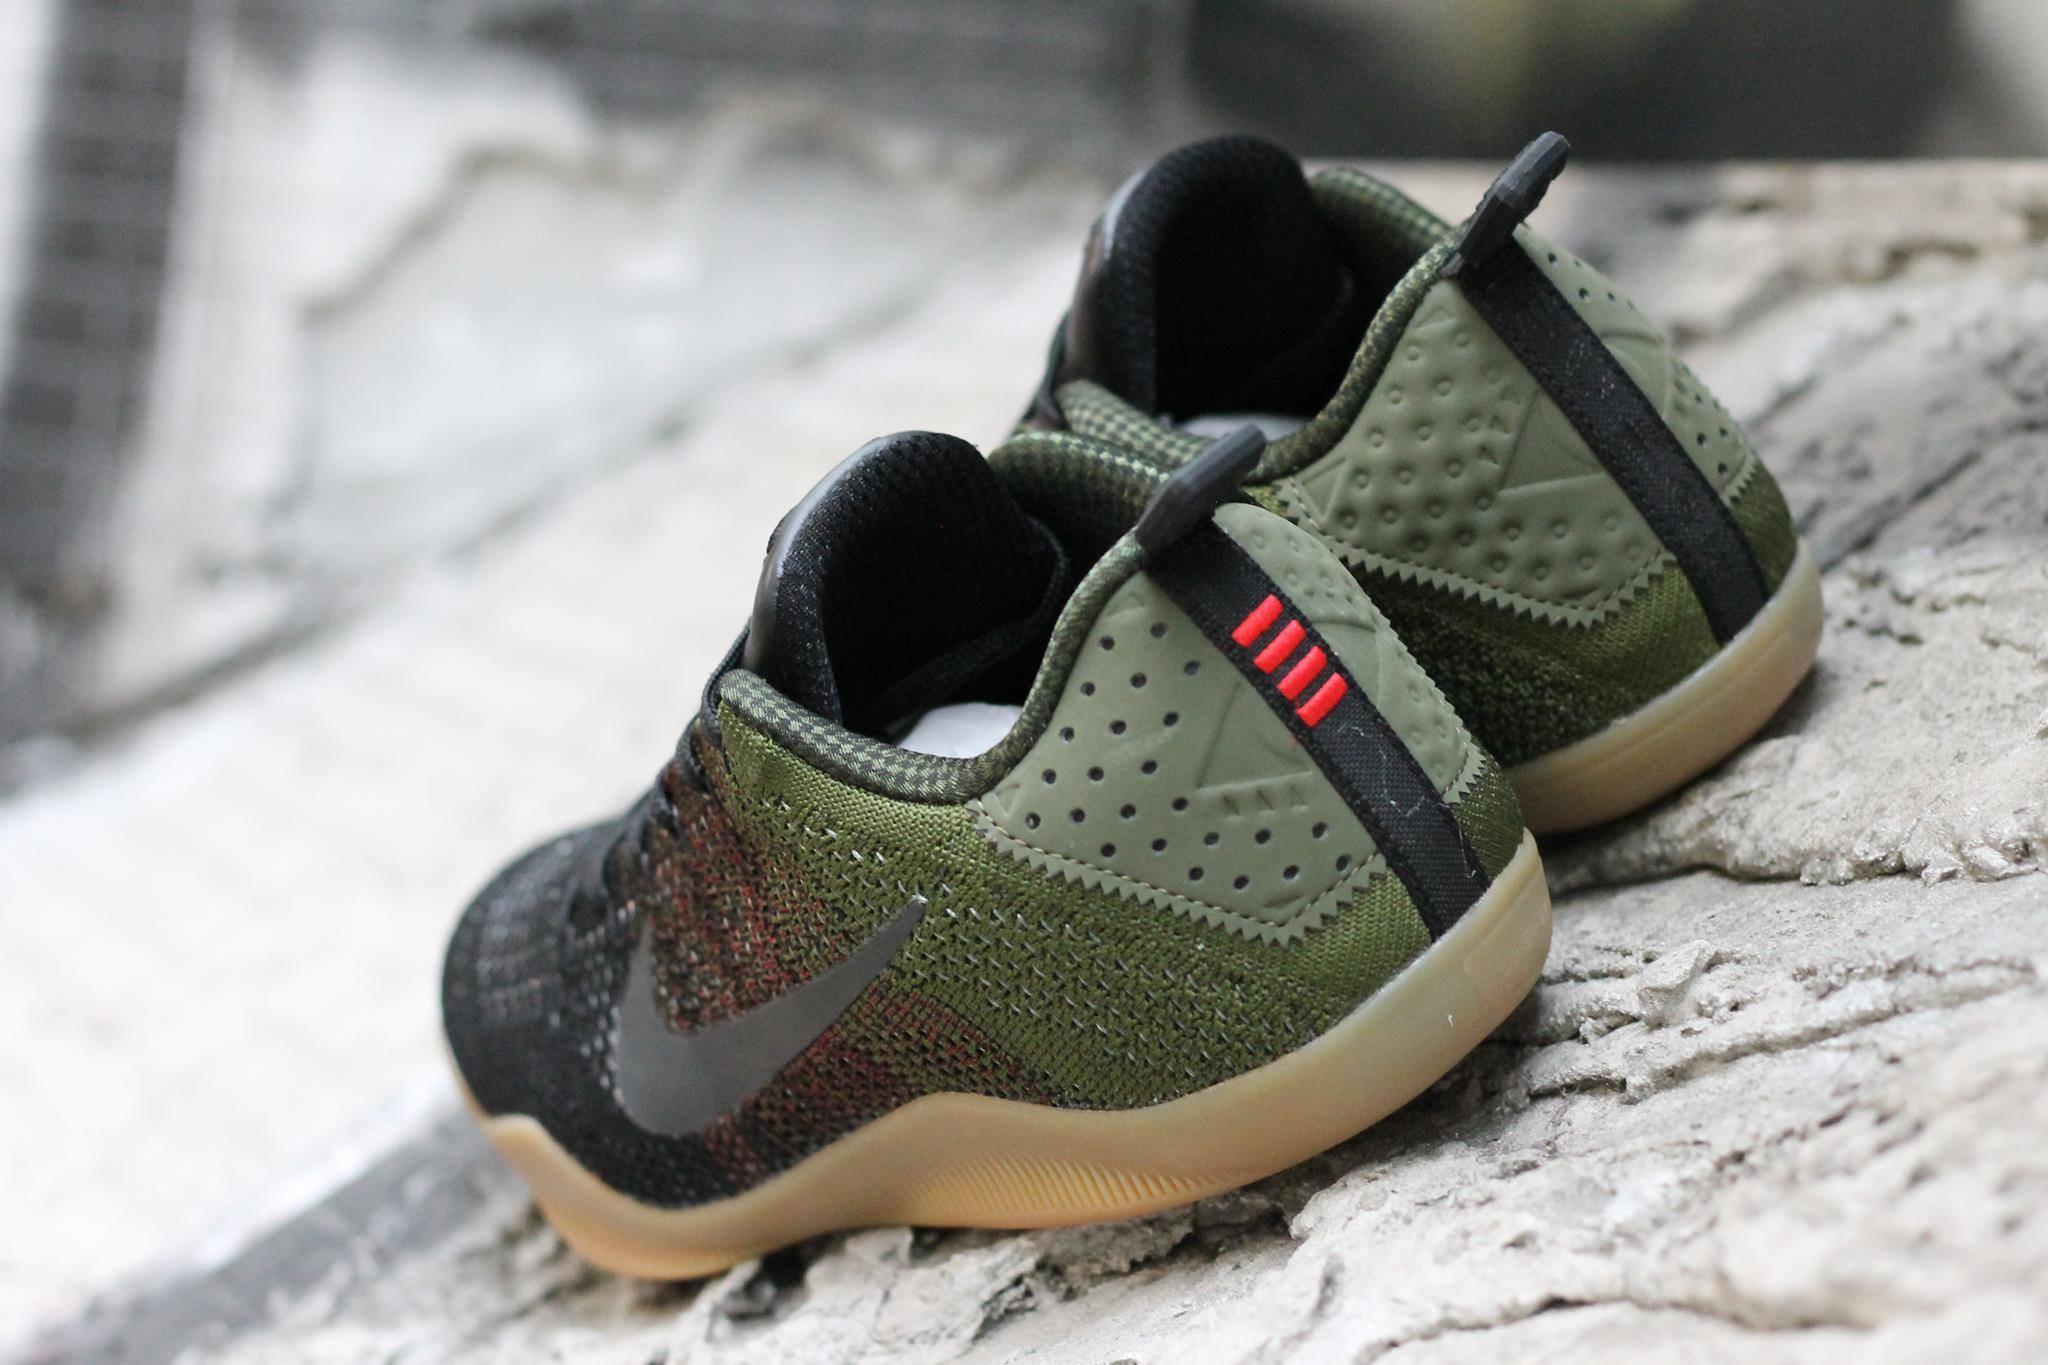 59f4ec1fc7f6 ... Horse Elite 4KB Release Date SneakerNews Nike Kobe 11 4KB Black Olive  Gum 2 .